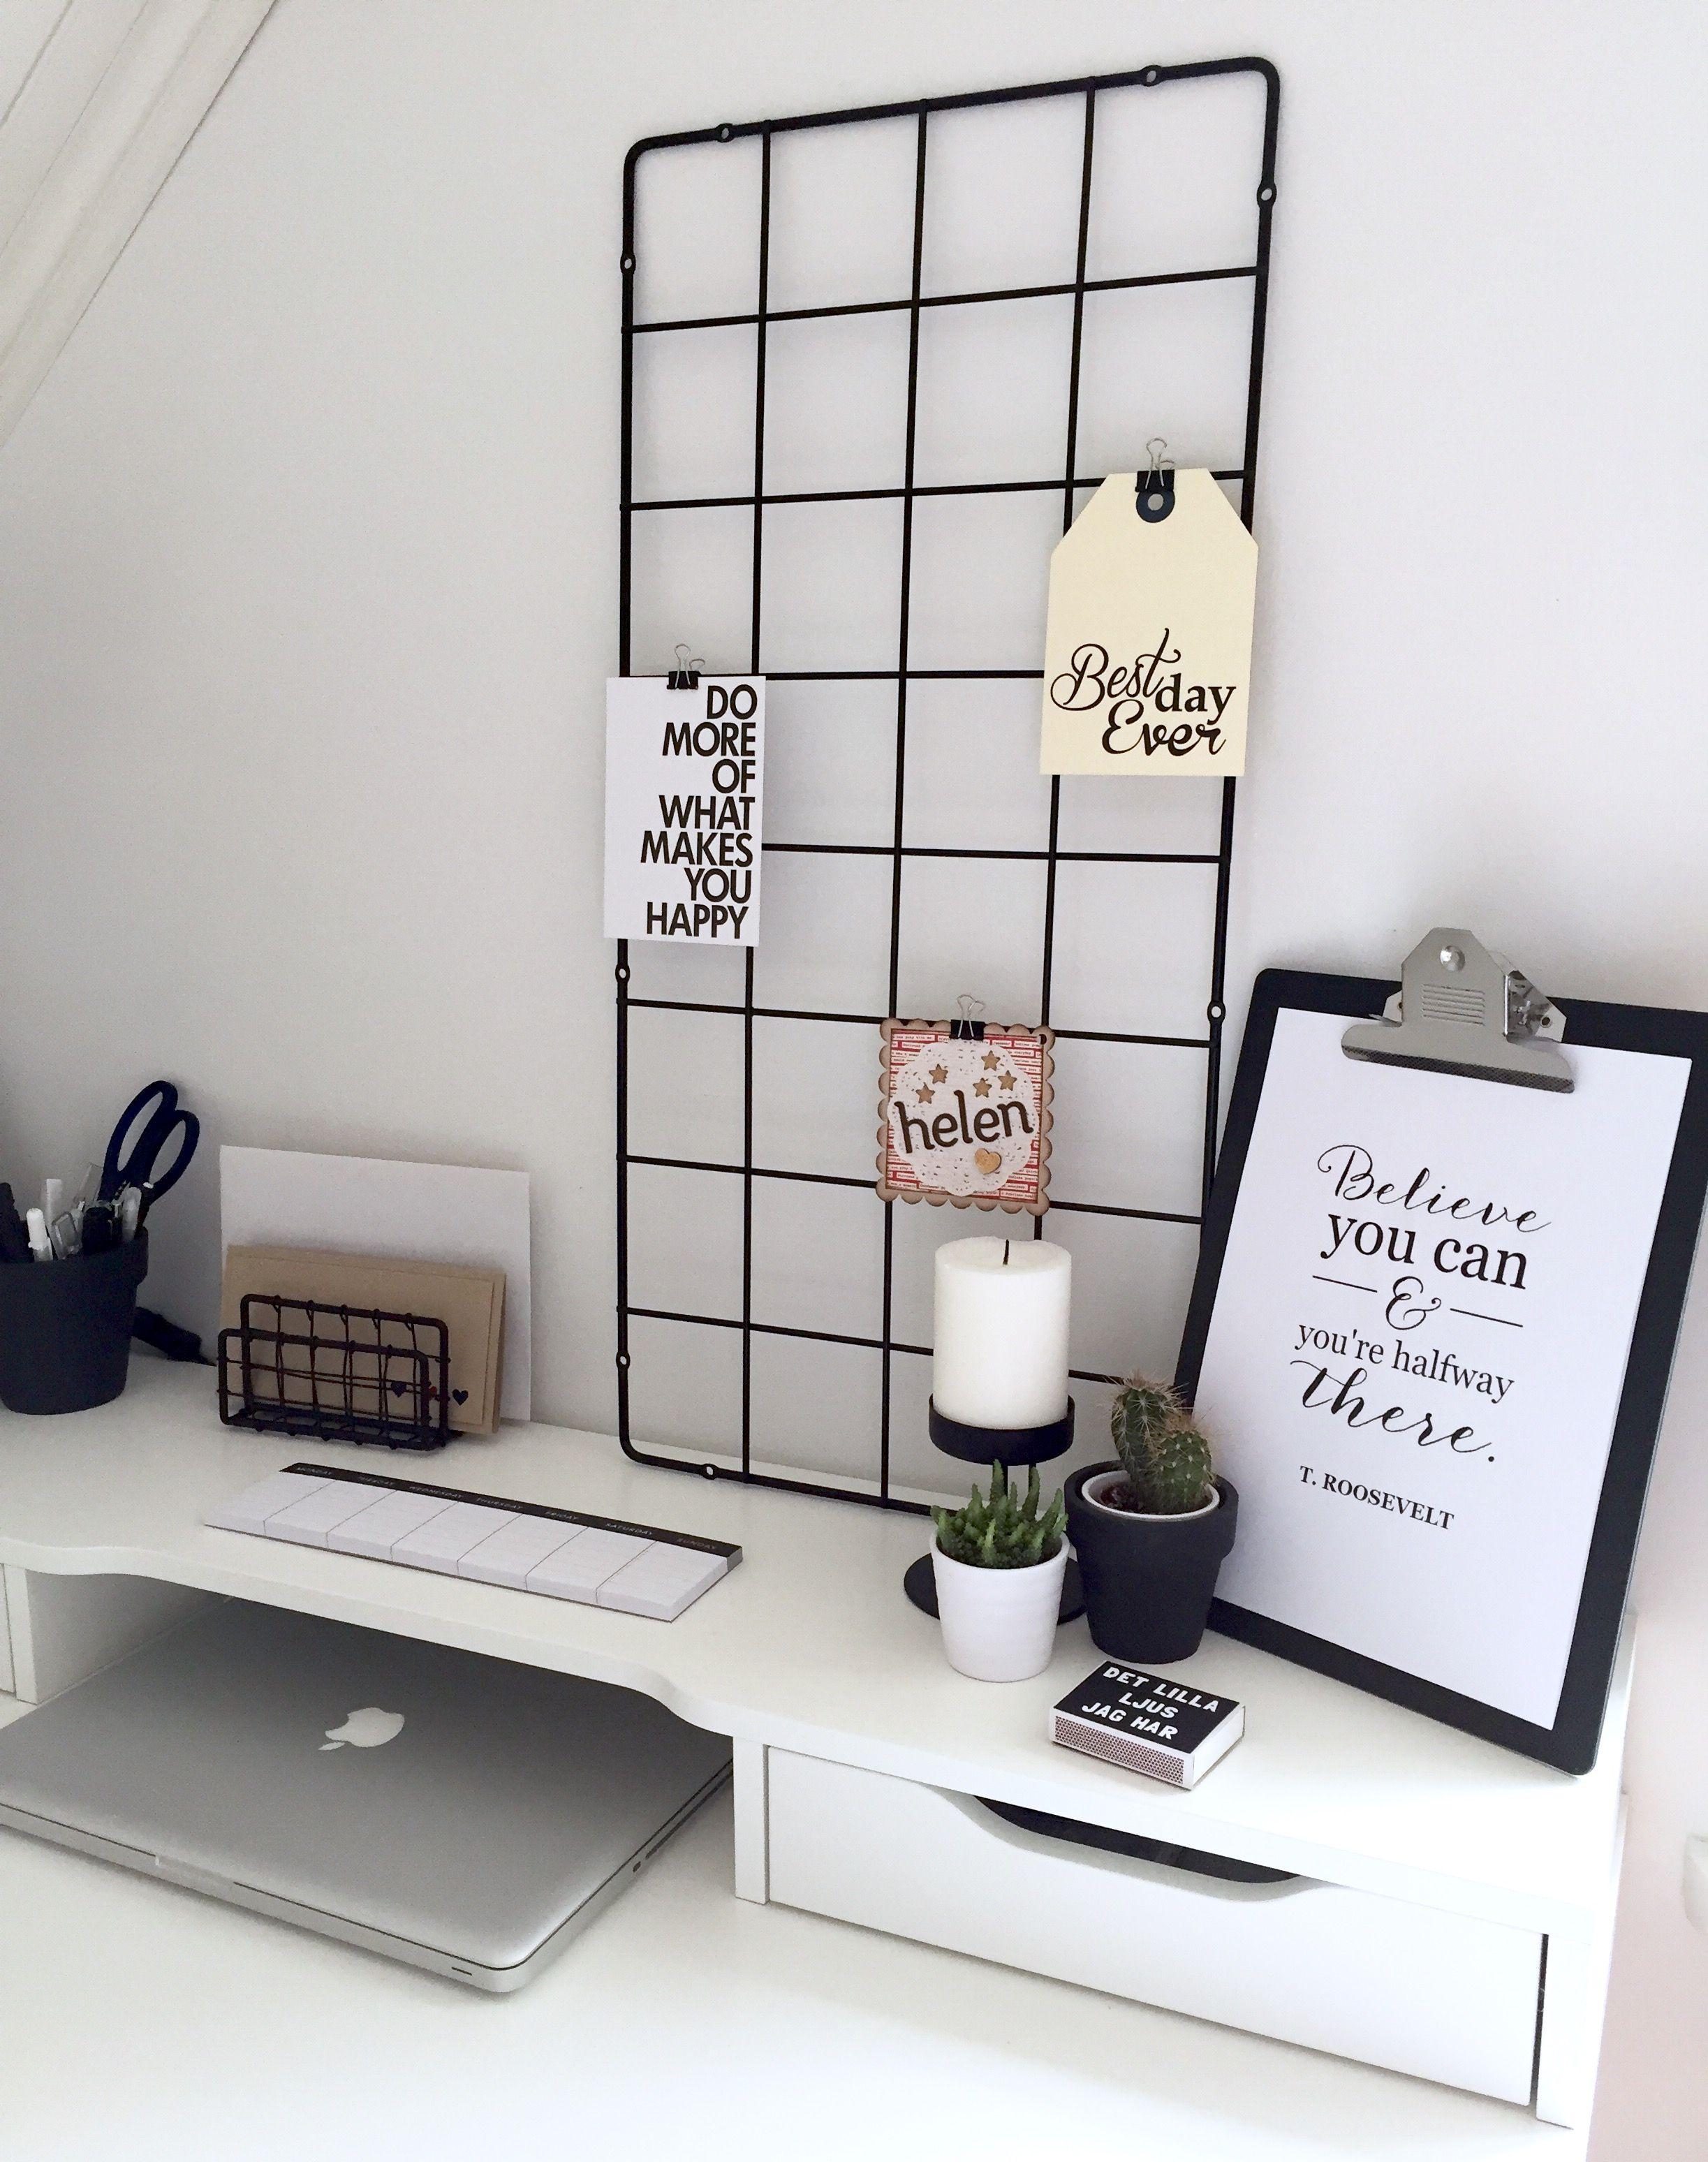 Minimalist black and white workspace ikea alex desk ikea for Black and white minimalist bedroom